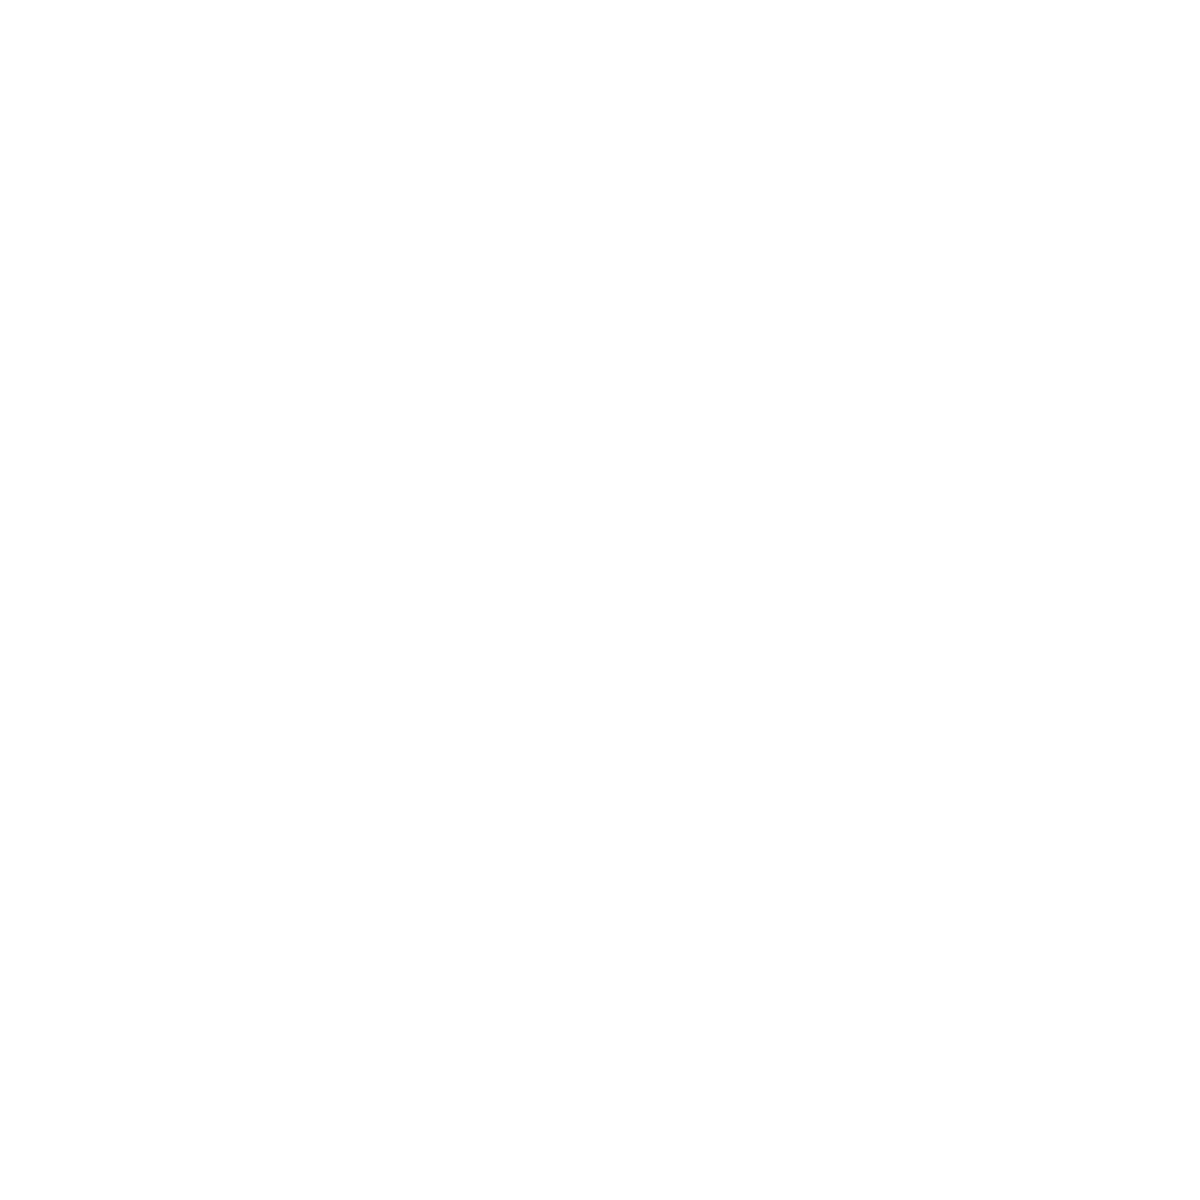 web design strategy white icon.png